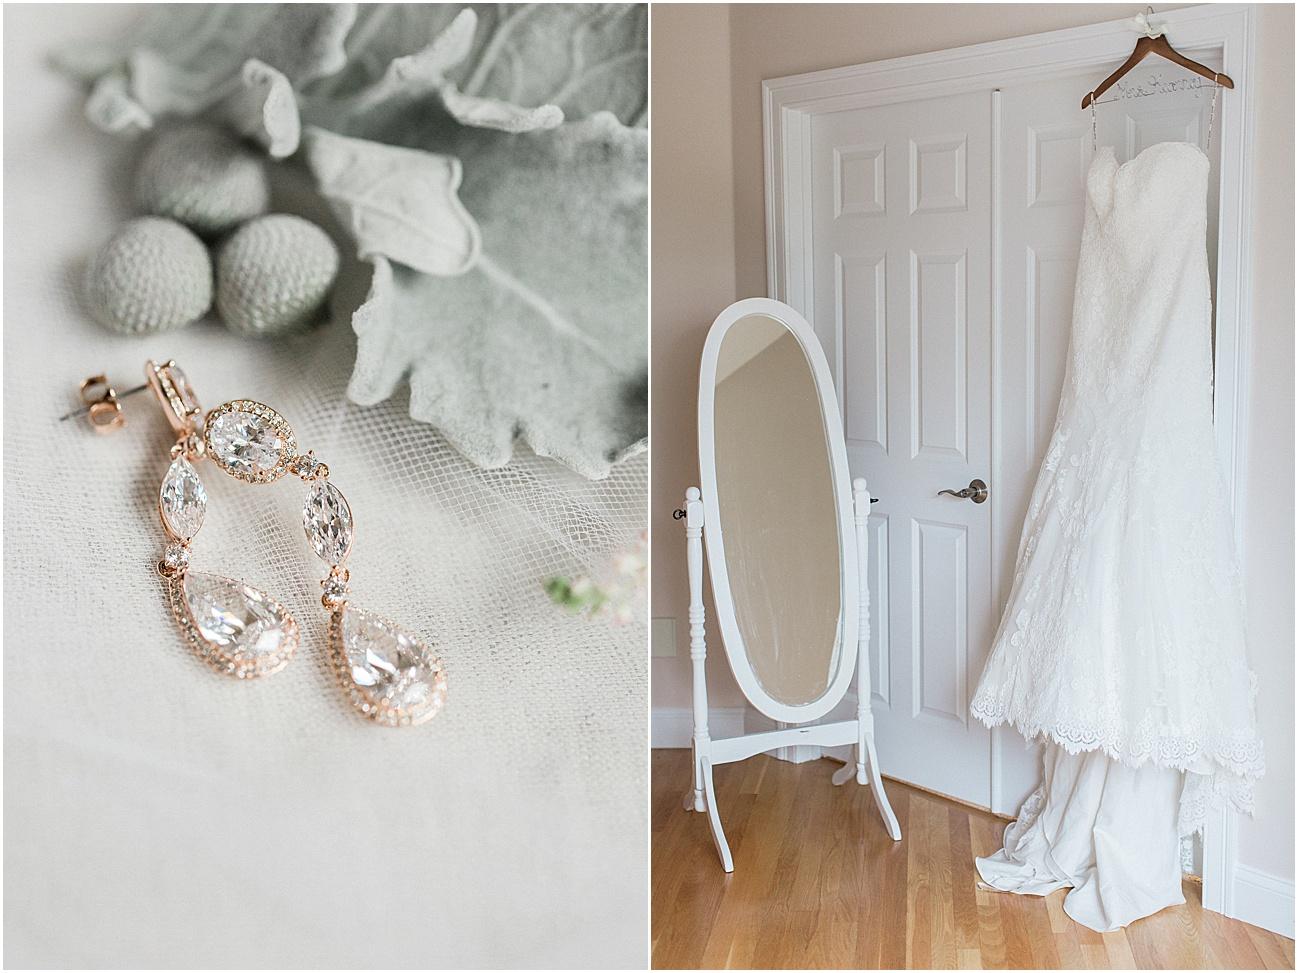 danielle_sean_willowbend_rain_rainy_day_cape_cod_boston_wedding_photographer_meredith_jane_photography_photo_1658.jpg